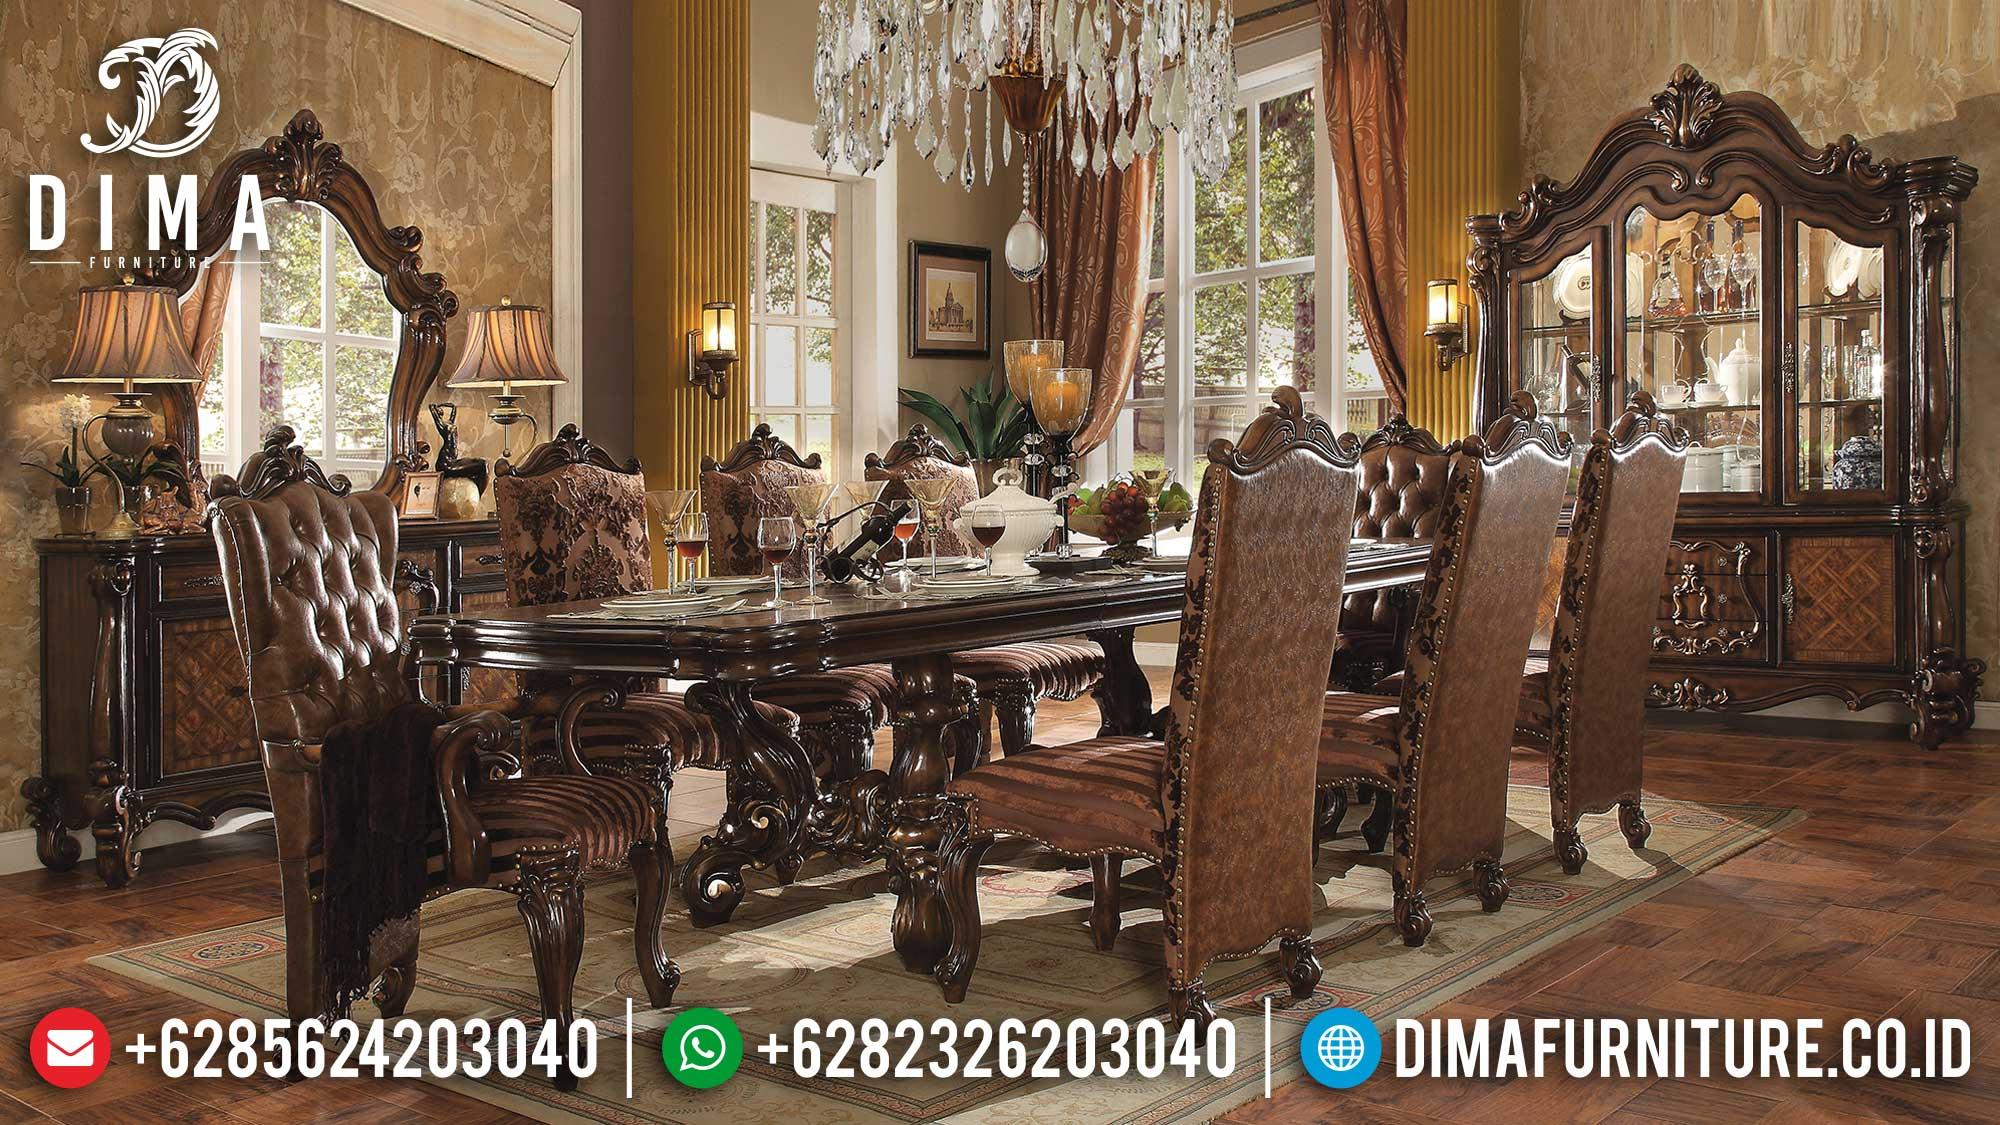 New Model Meja Makan Mewah Terbaru Luxury Carving Jepara TTJ-1688